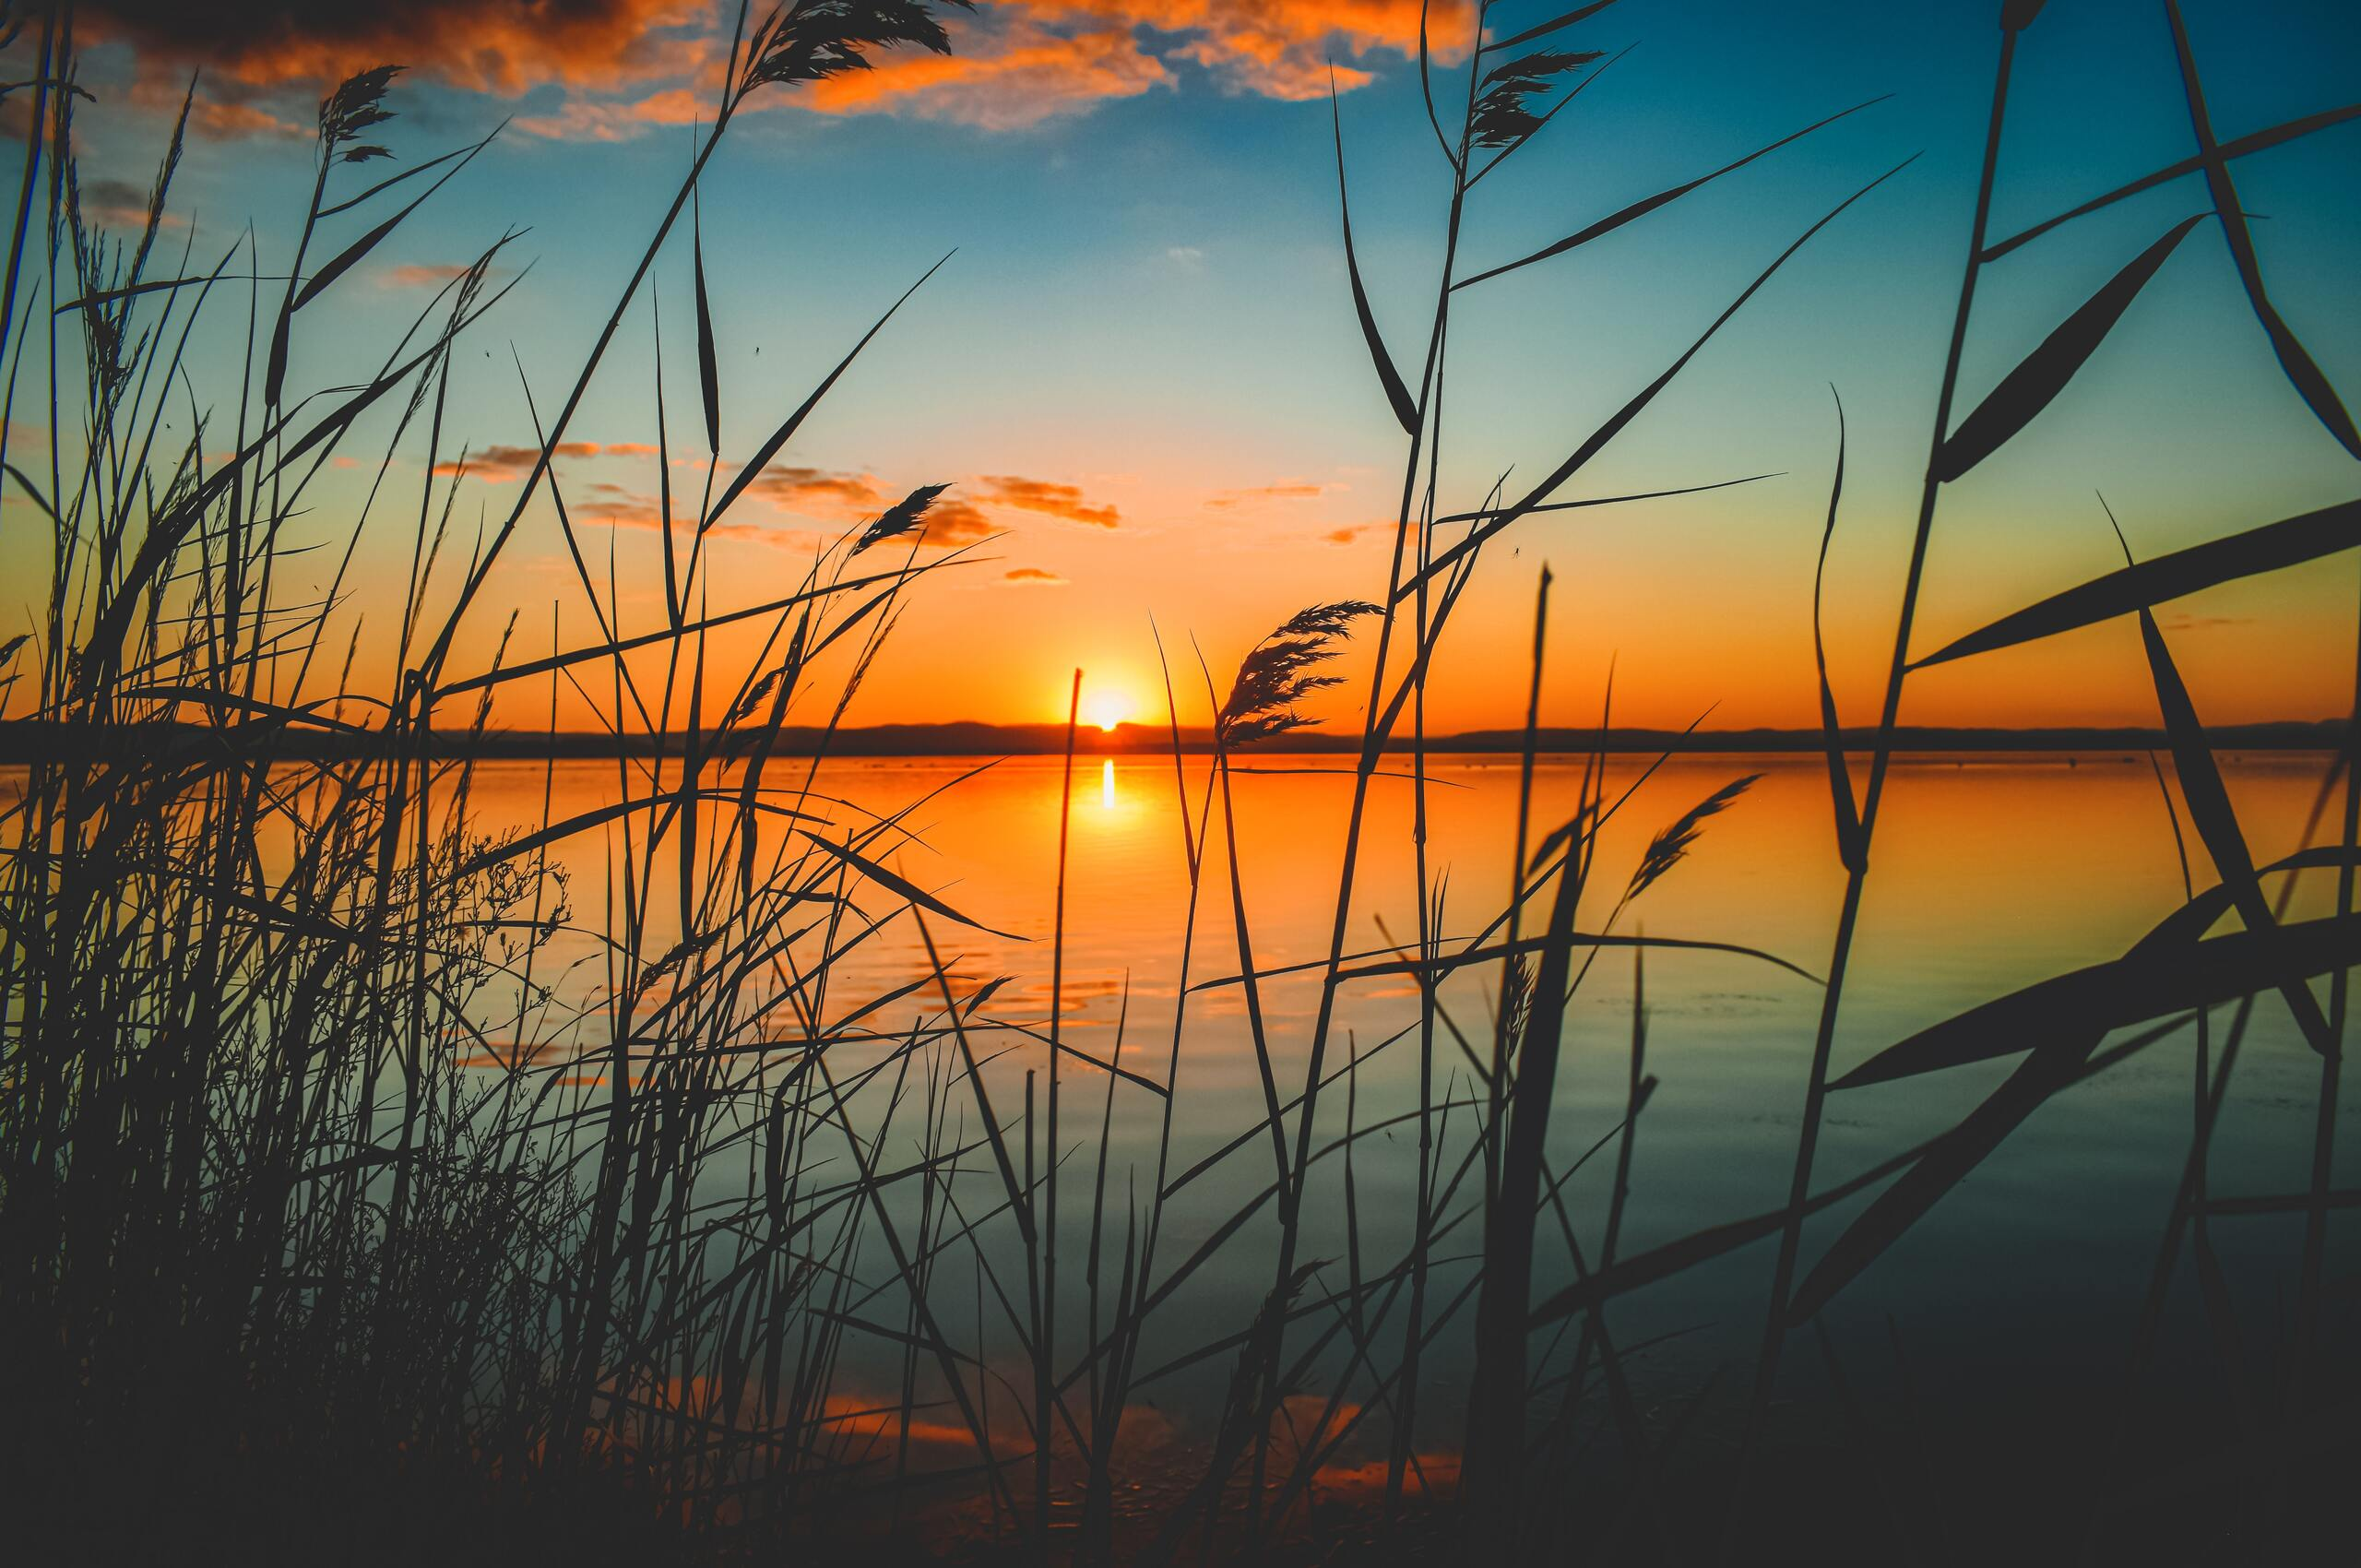 scenic-view-of-lake-during-sunset-5k-7n.jpg